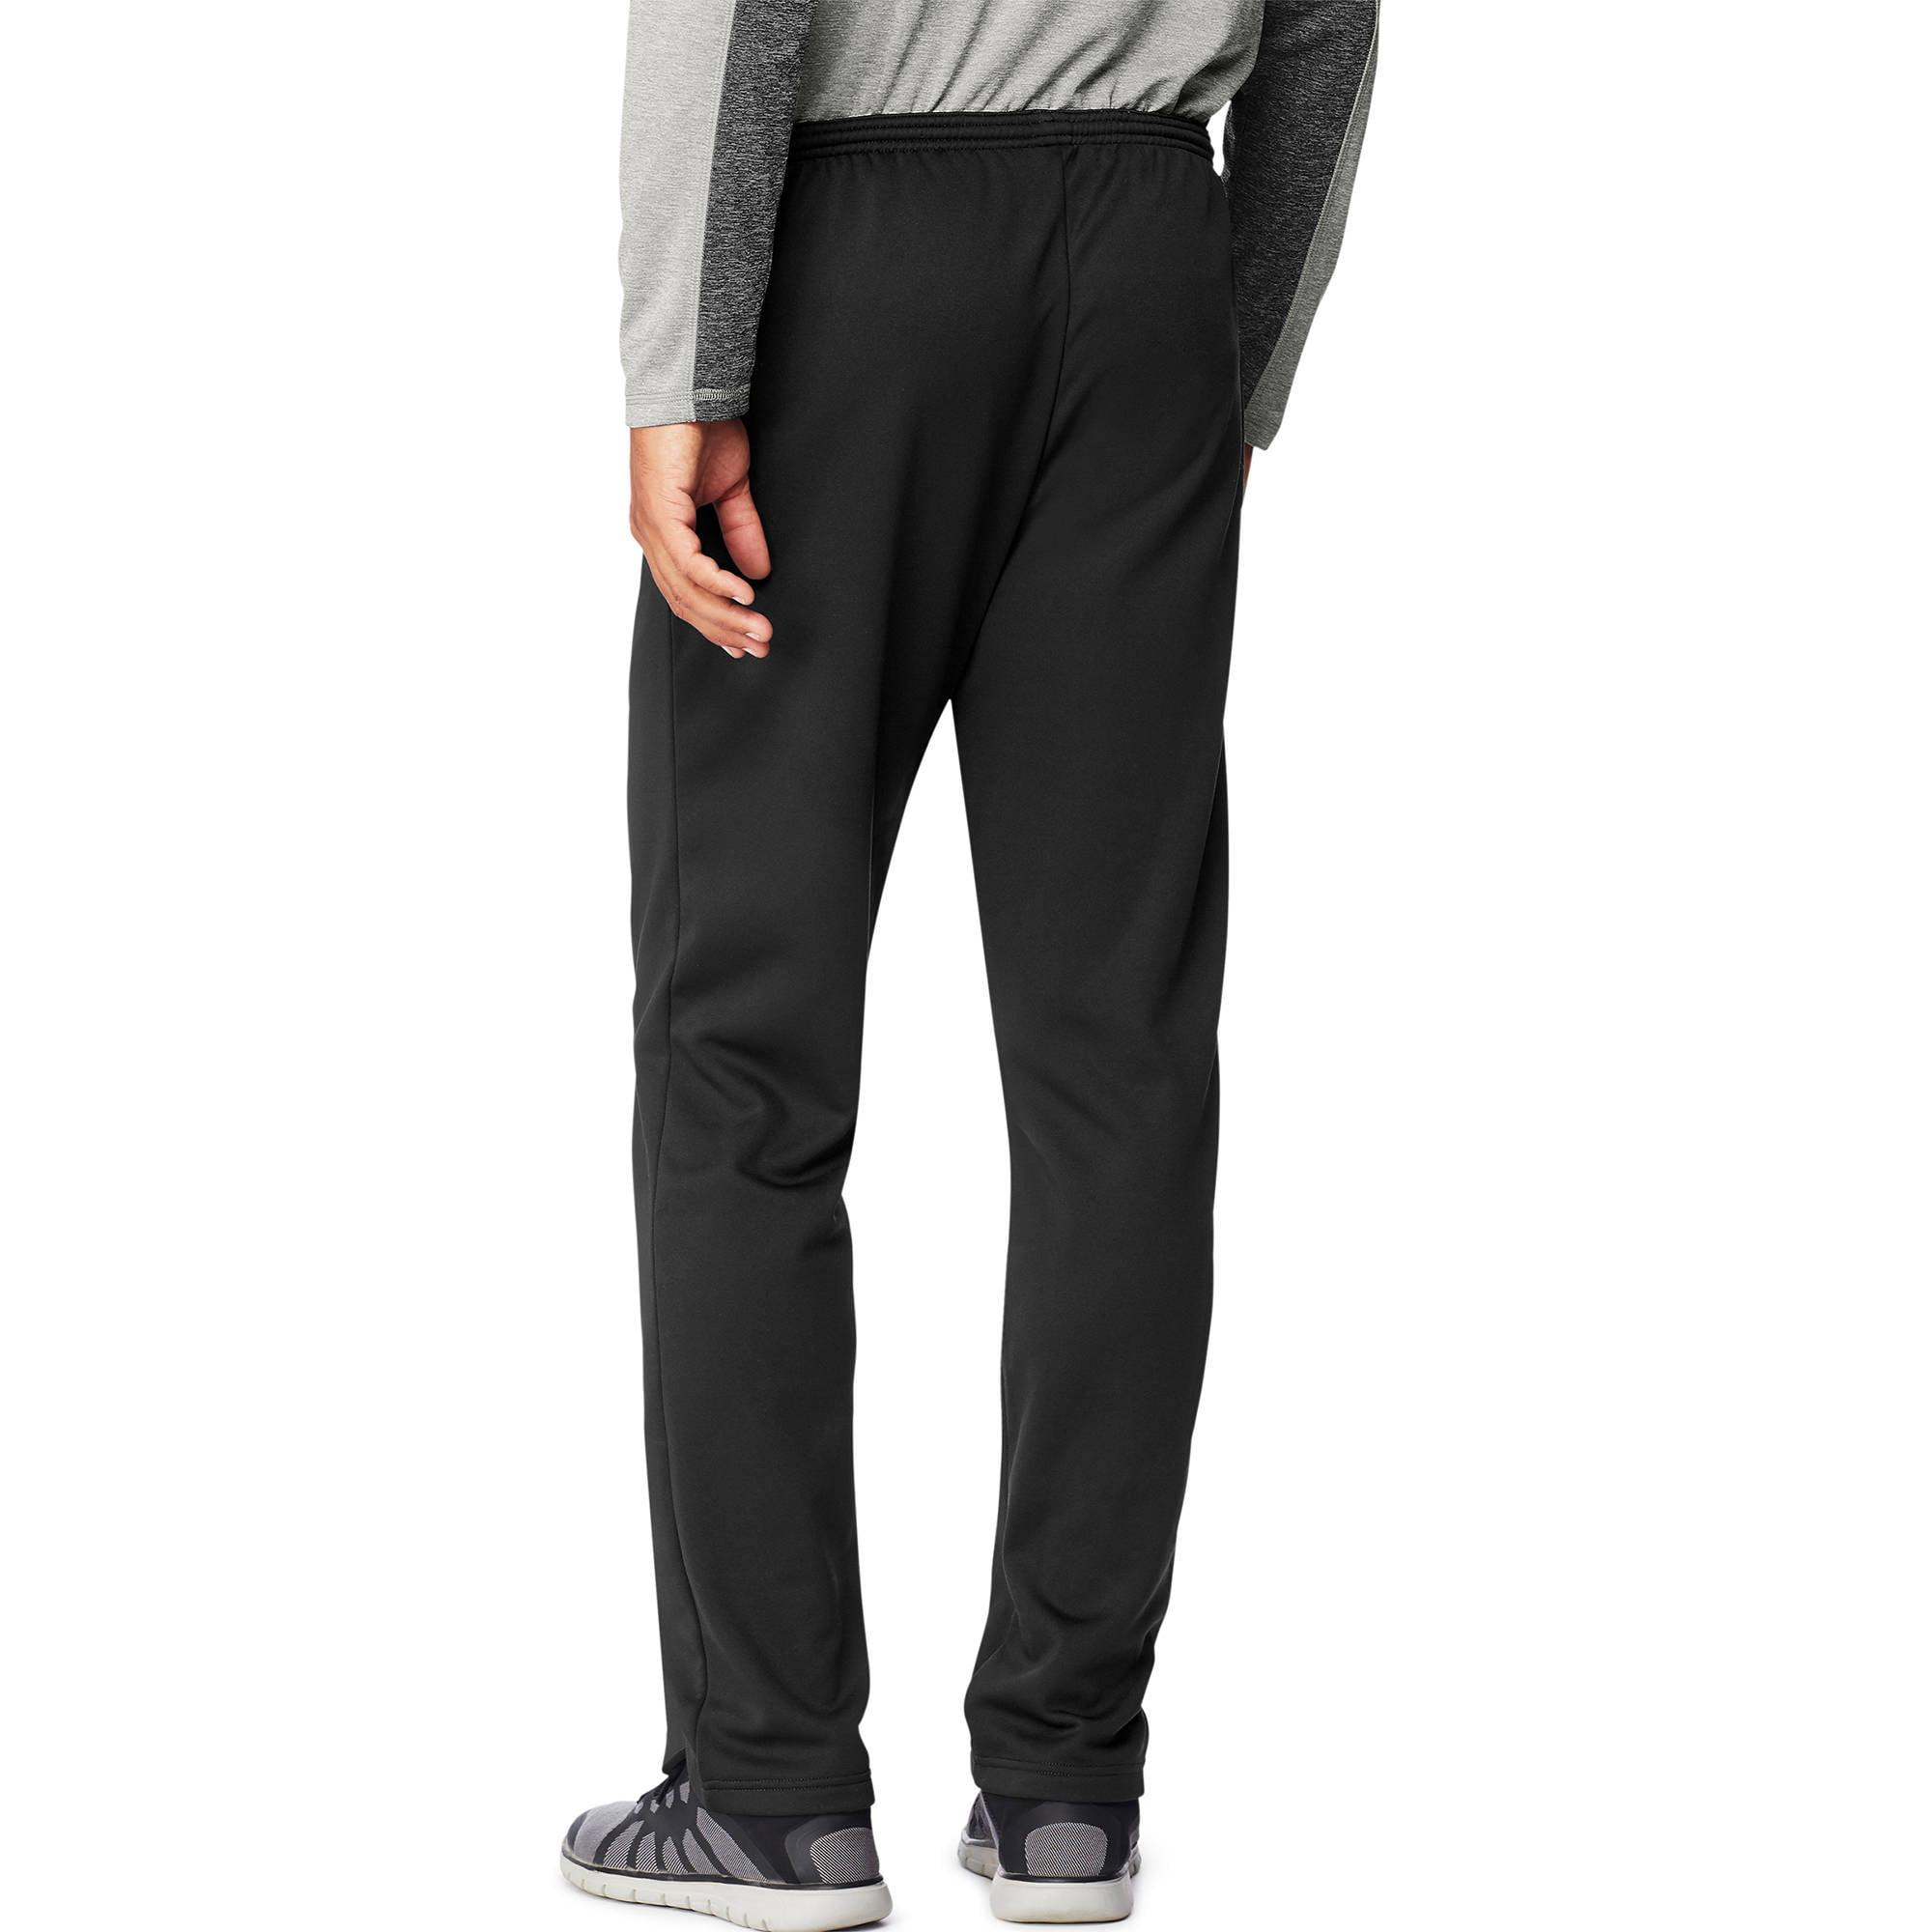 Hanes Sport Big Men's Performance Sweatpants with Pockets